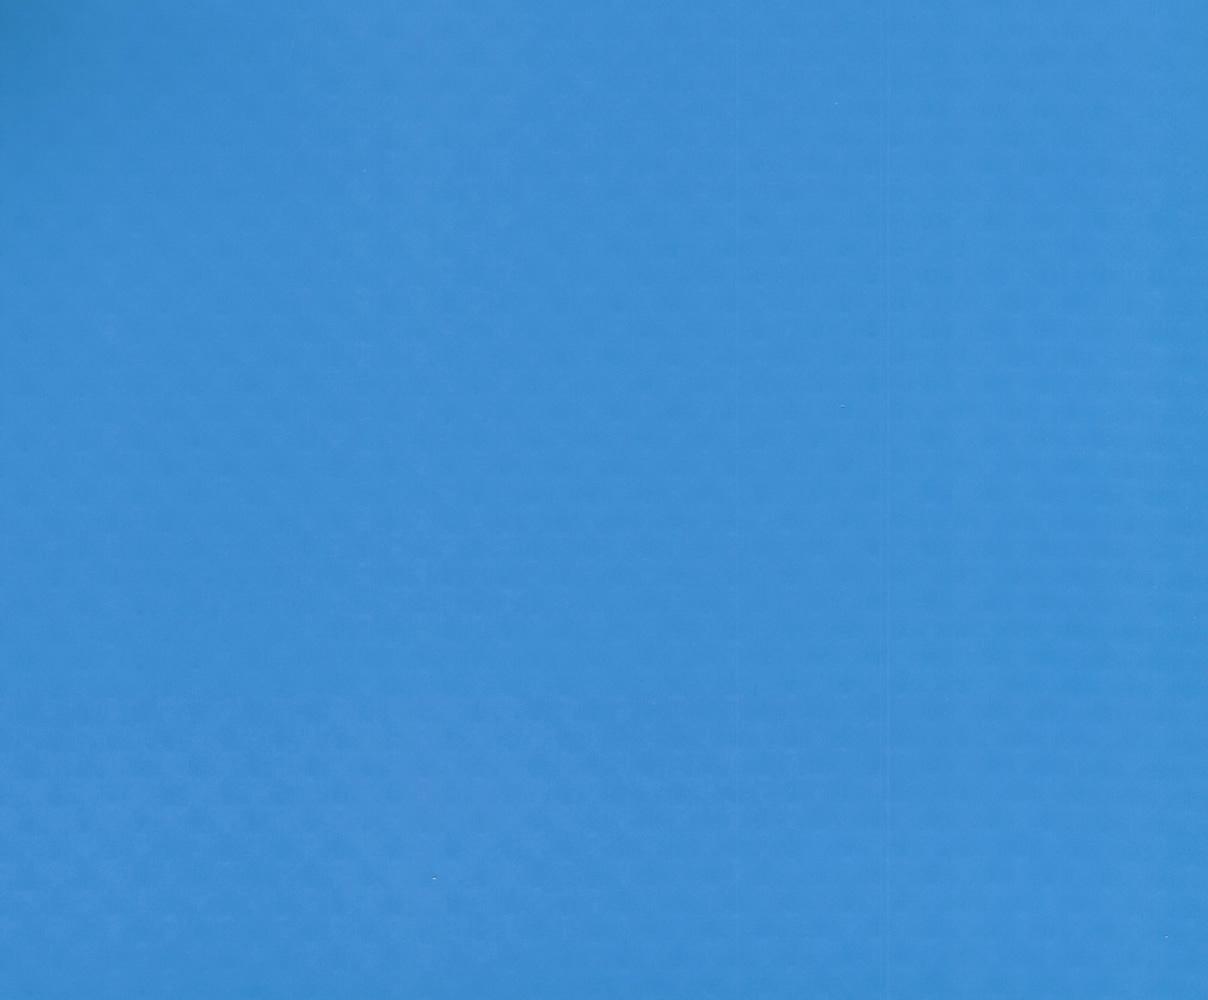 Bazénová fólie z PVC-P ALKORPLAN modrá adria 1,5 mm